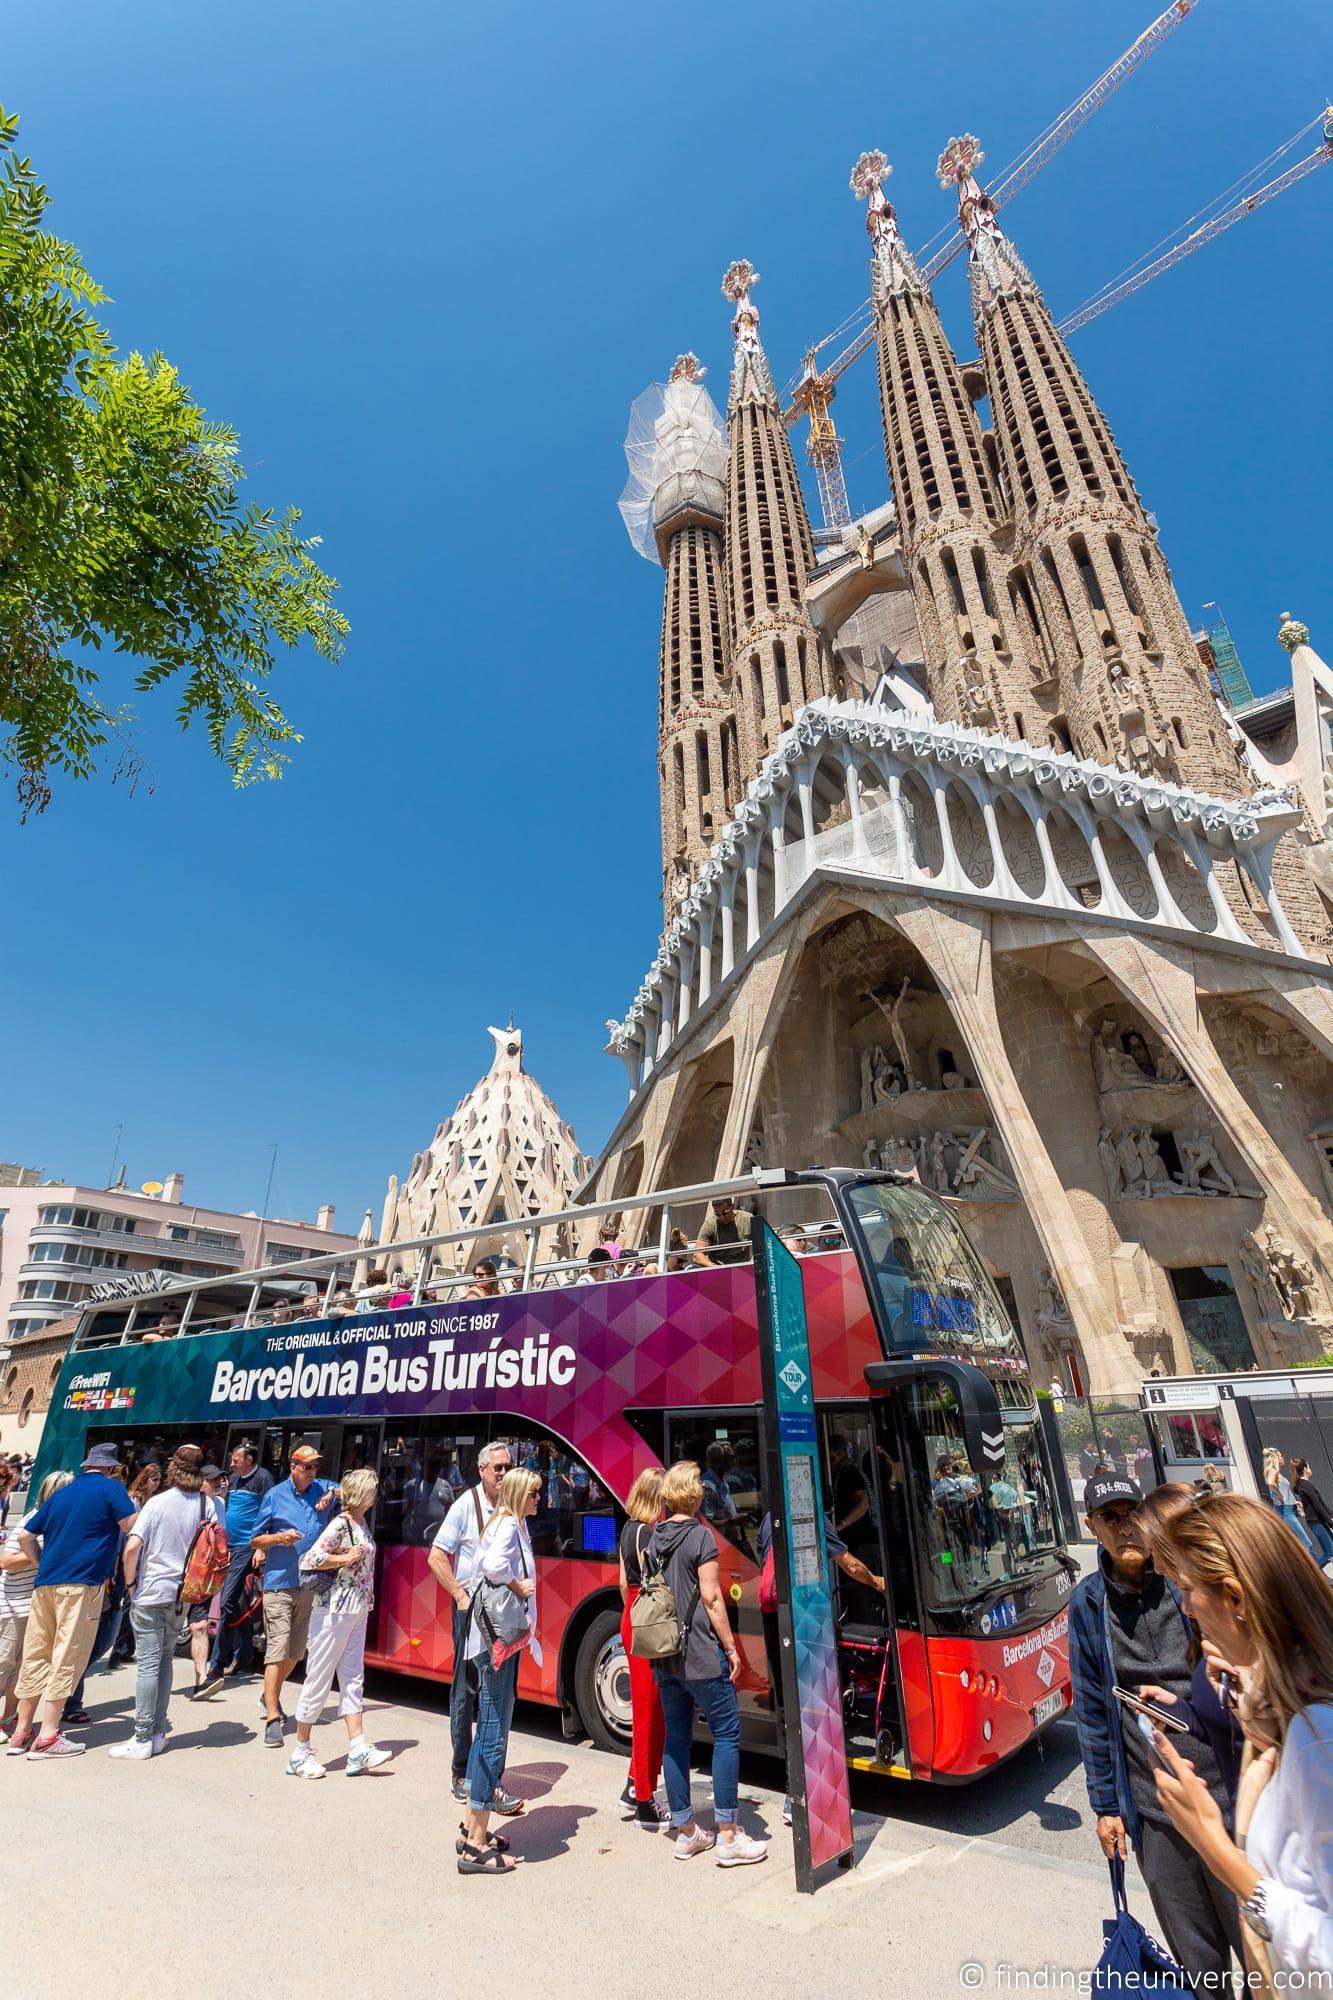 Sagrada Familia Barcelona Bus Turistic Stop